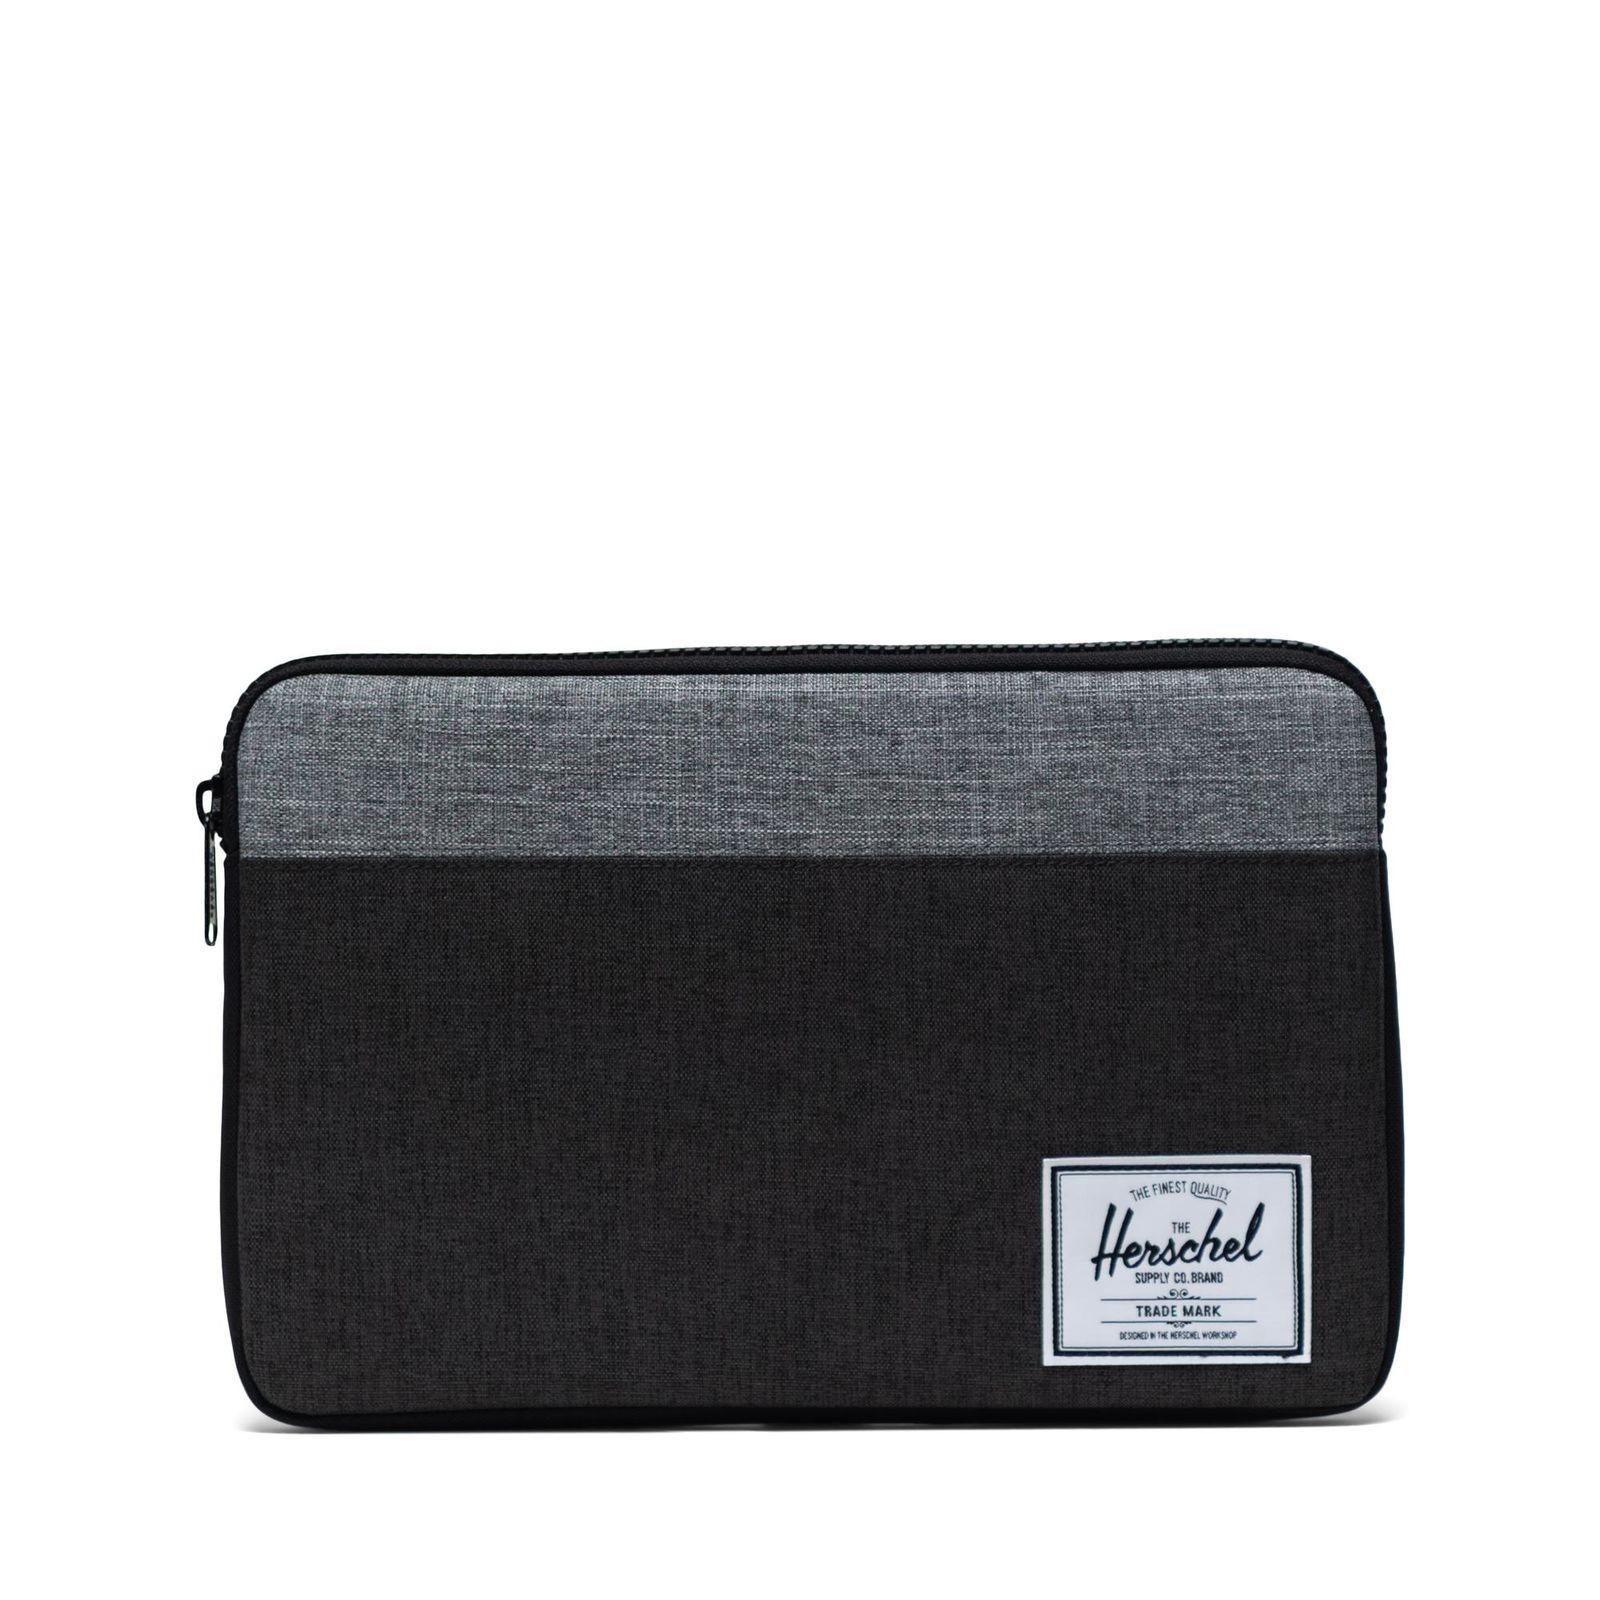 Herschel Laptop Kılıfı Anchor Sleeve for 12 inch MacBook Black Crosshatch/Black/Raven Crosshatch